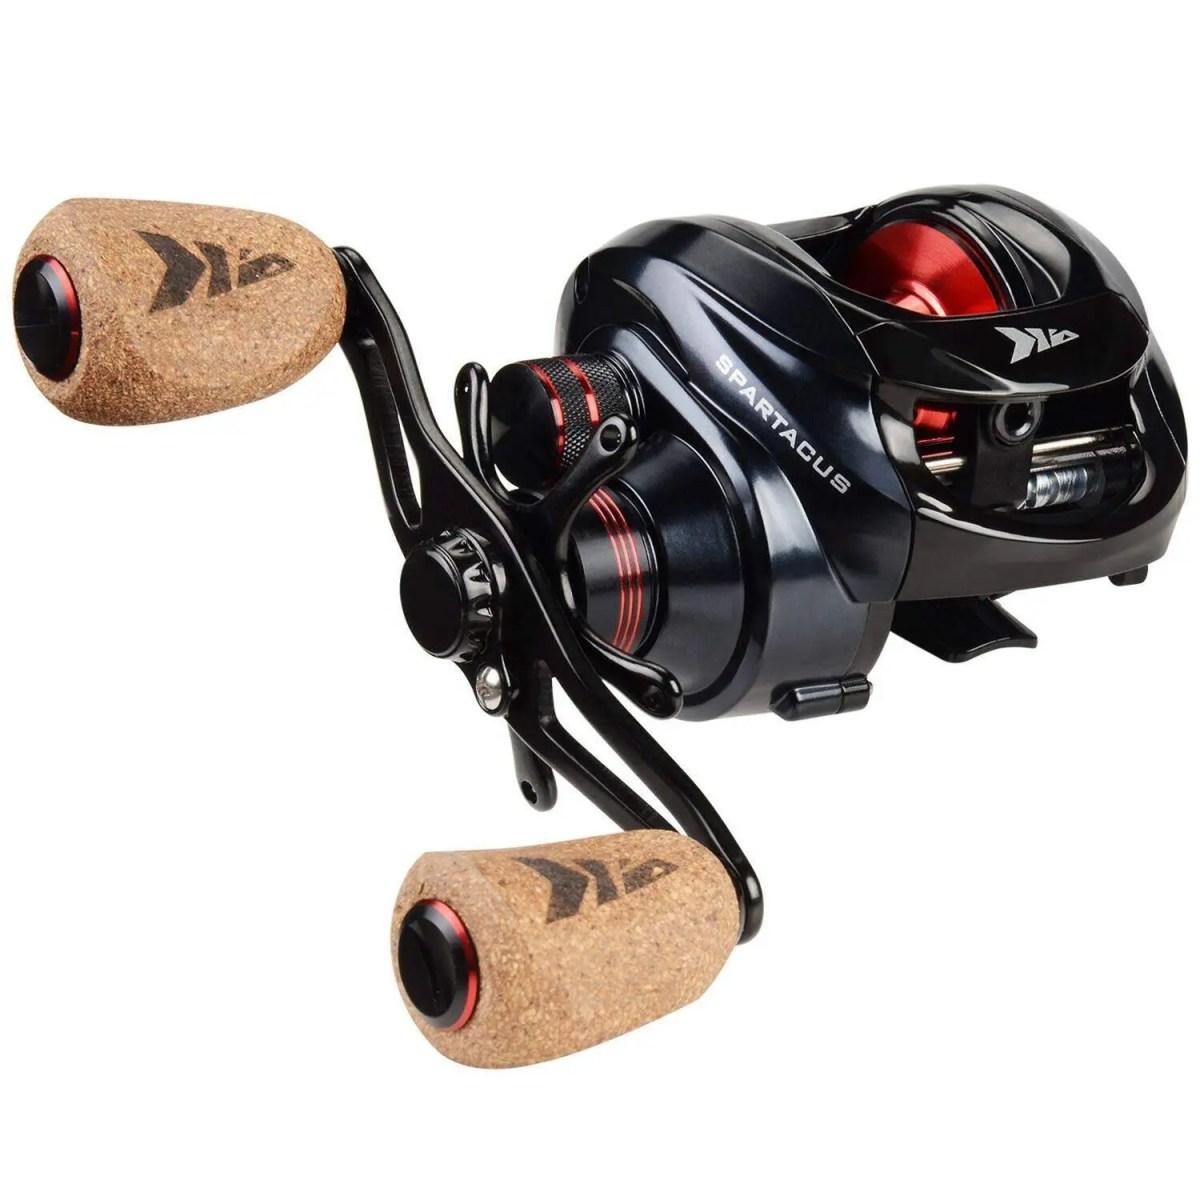 KastKing Spartacus Plus Baitcasting Fishing Reel Ultra Smooth